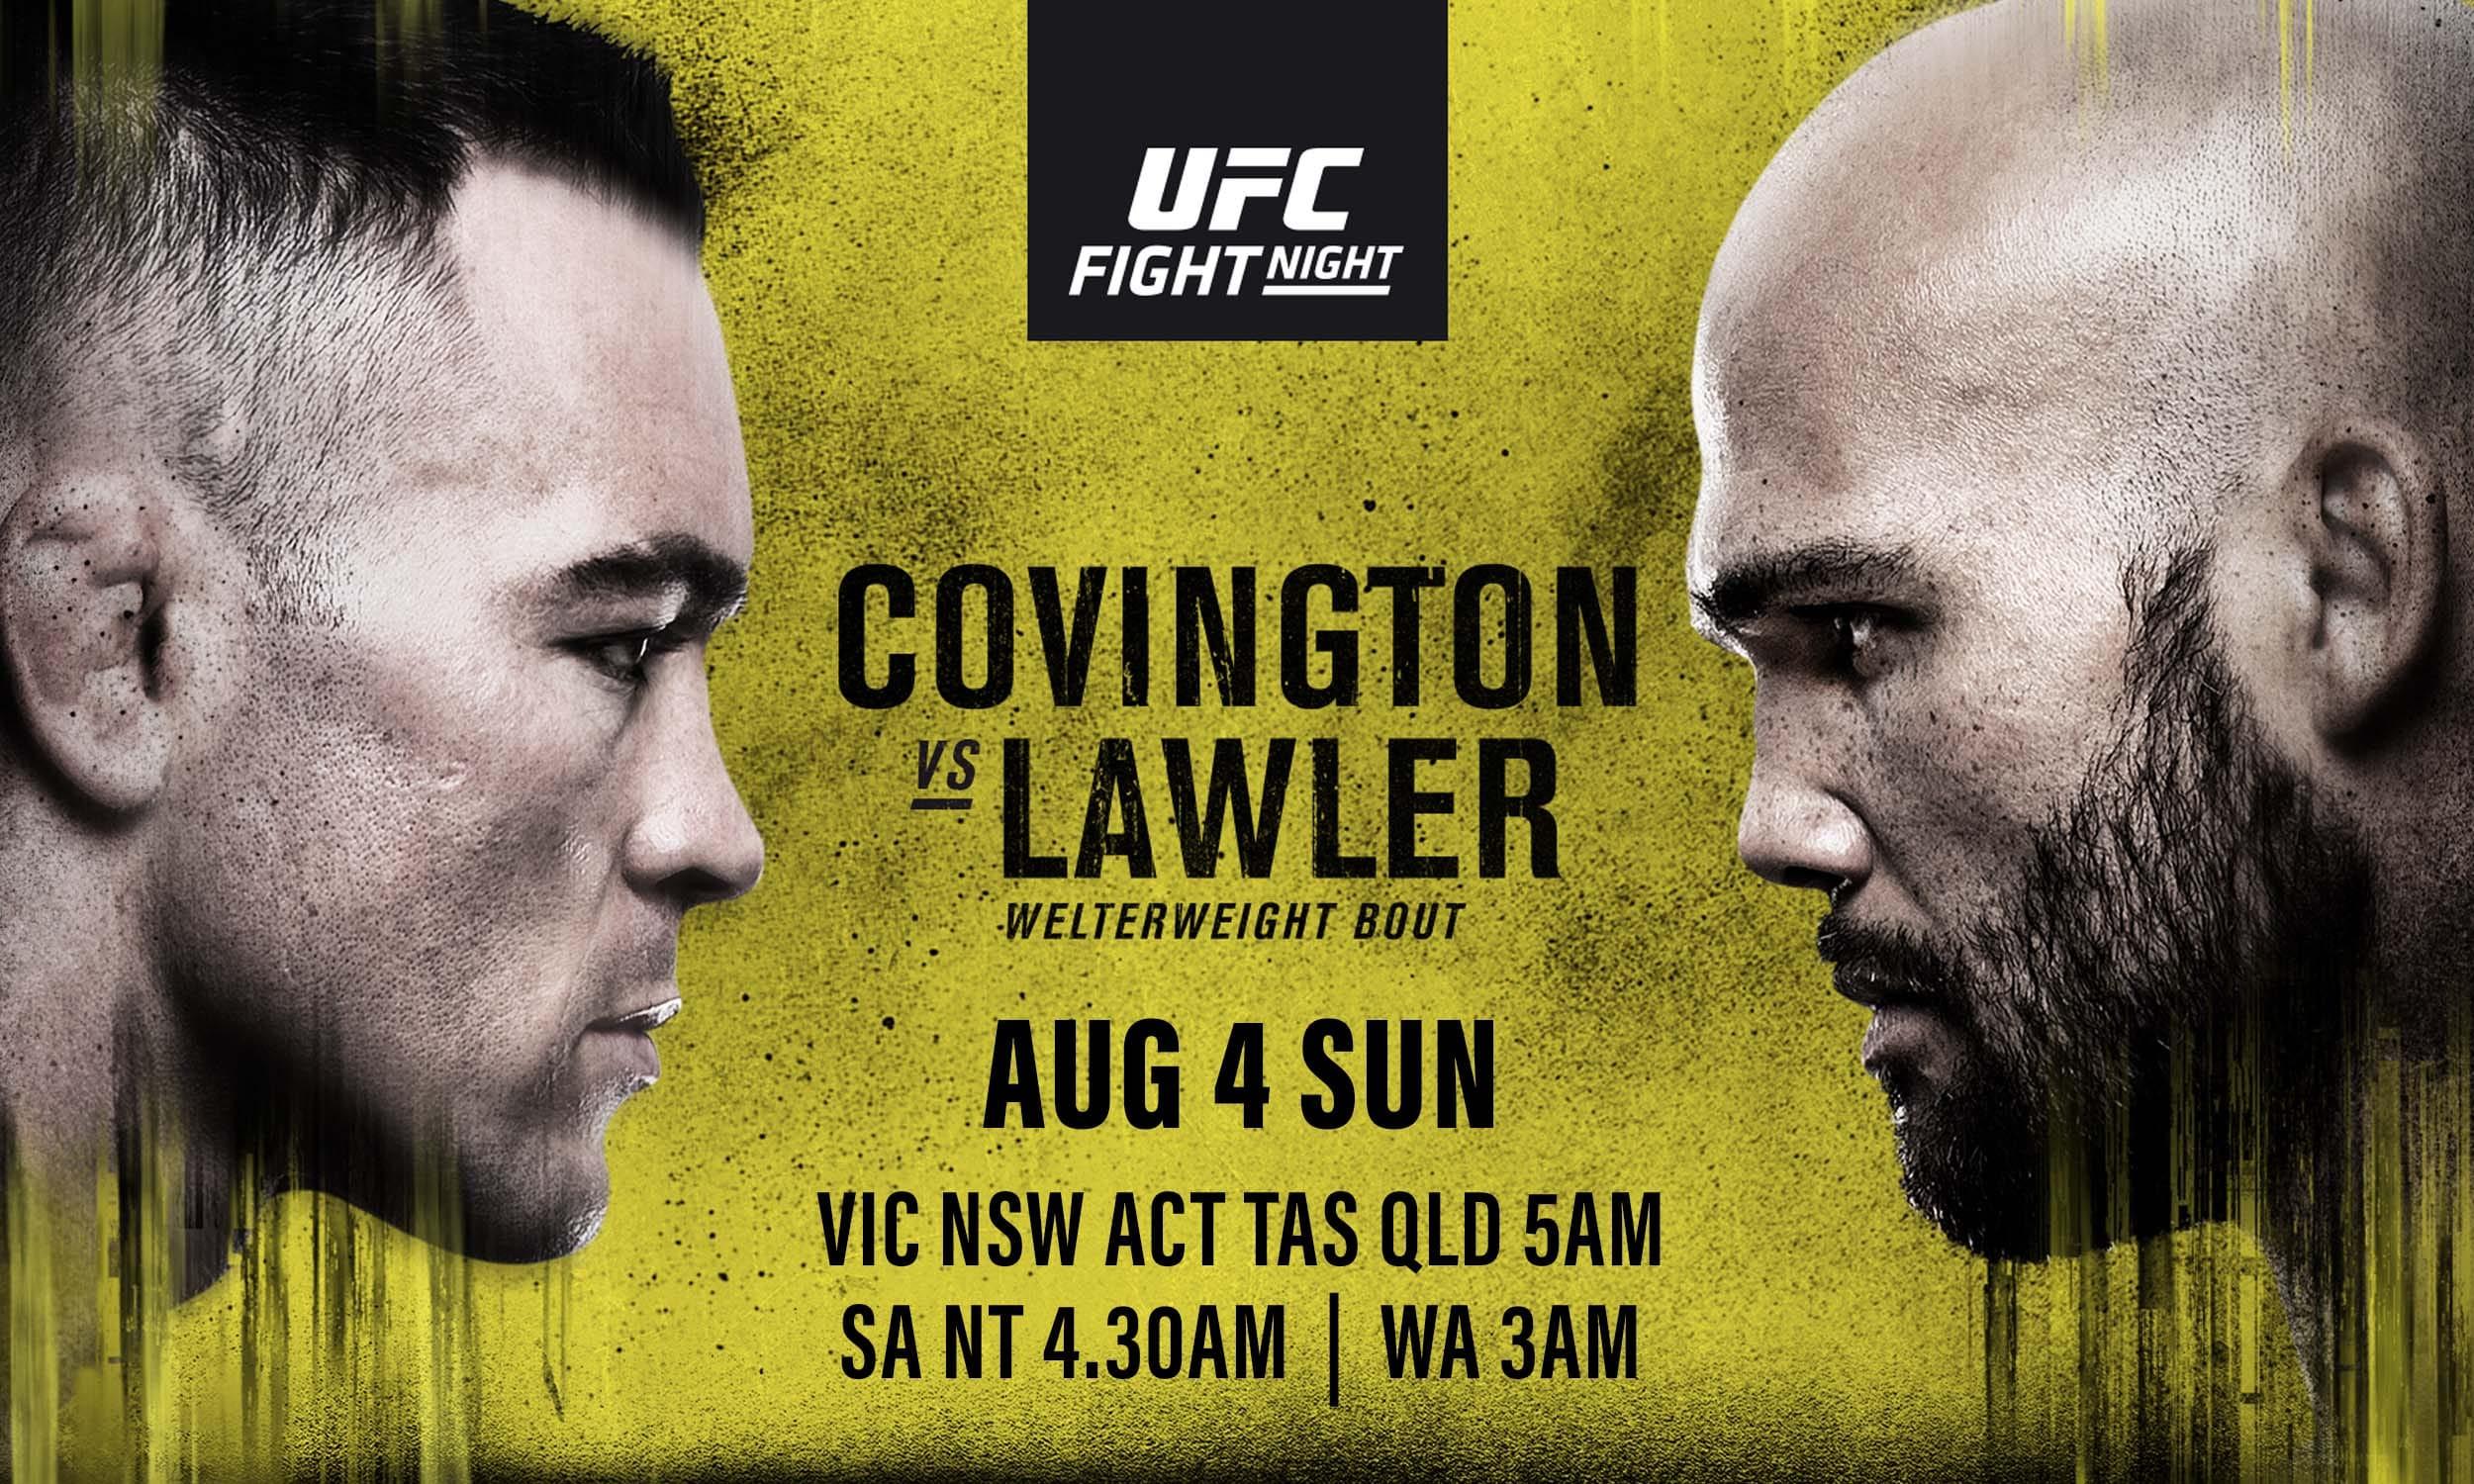 UFC Fight Night_Covington vs Lawler_Aug 4_BATP-min.jpg